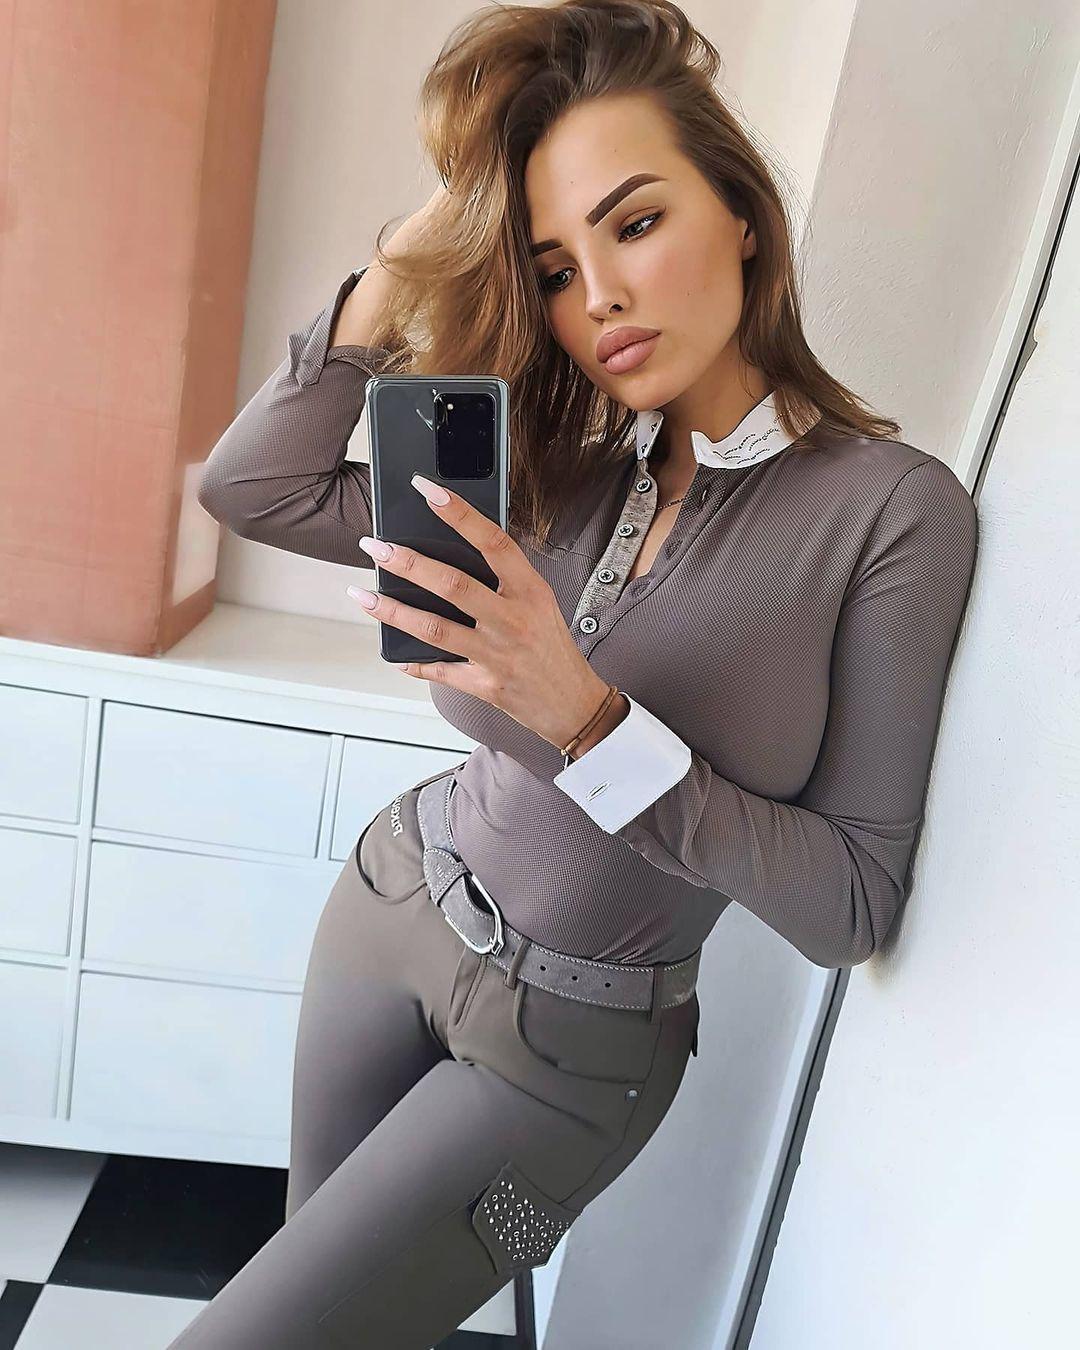 Elizaveta-Berejnaya-Wallpapers-Insta-Fit-Bio-Miss-elizabeth-sol-Wallpapers-Insta-Fit-Bio-2